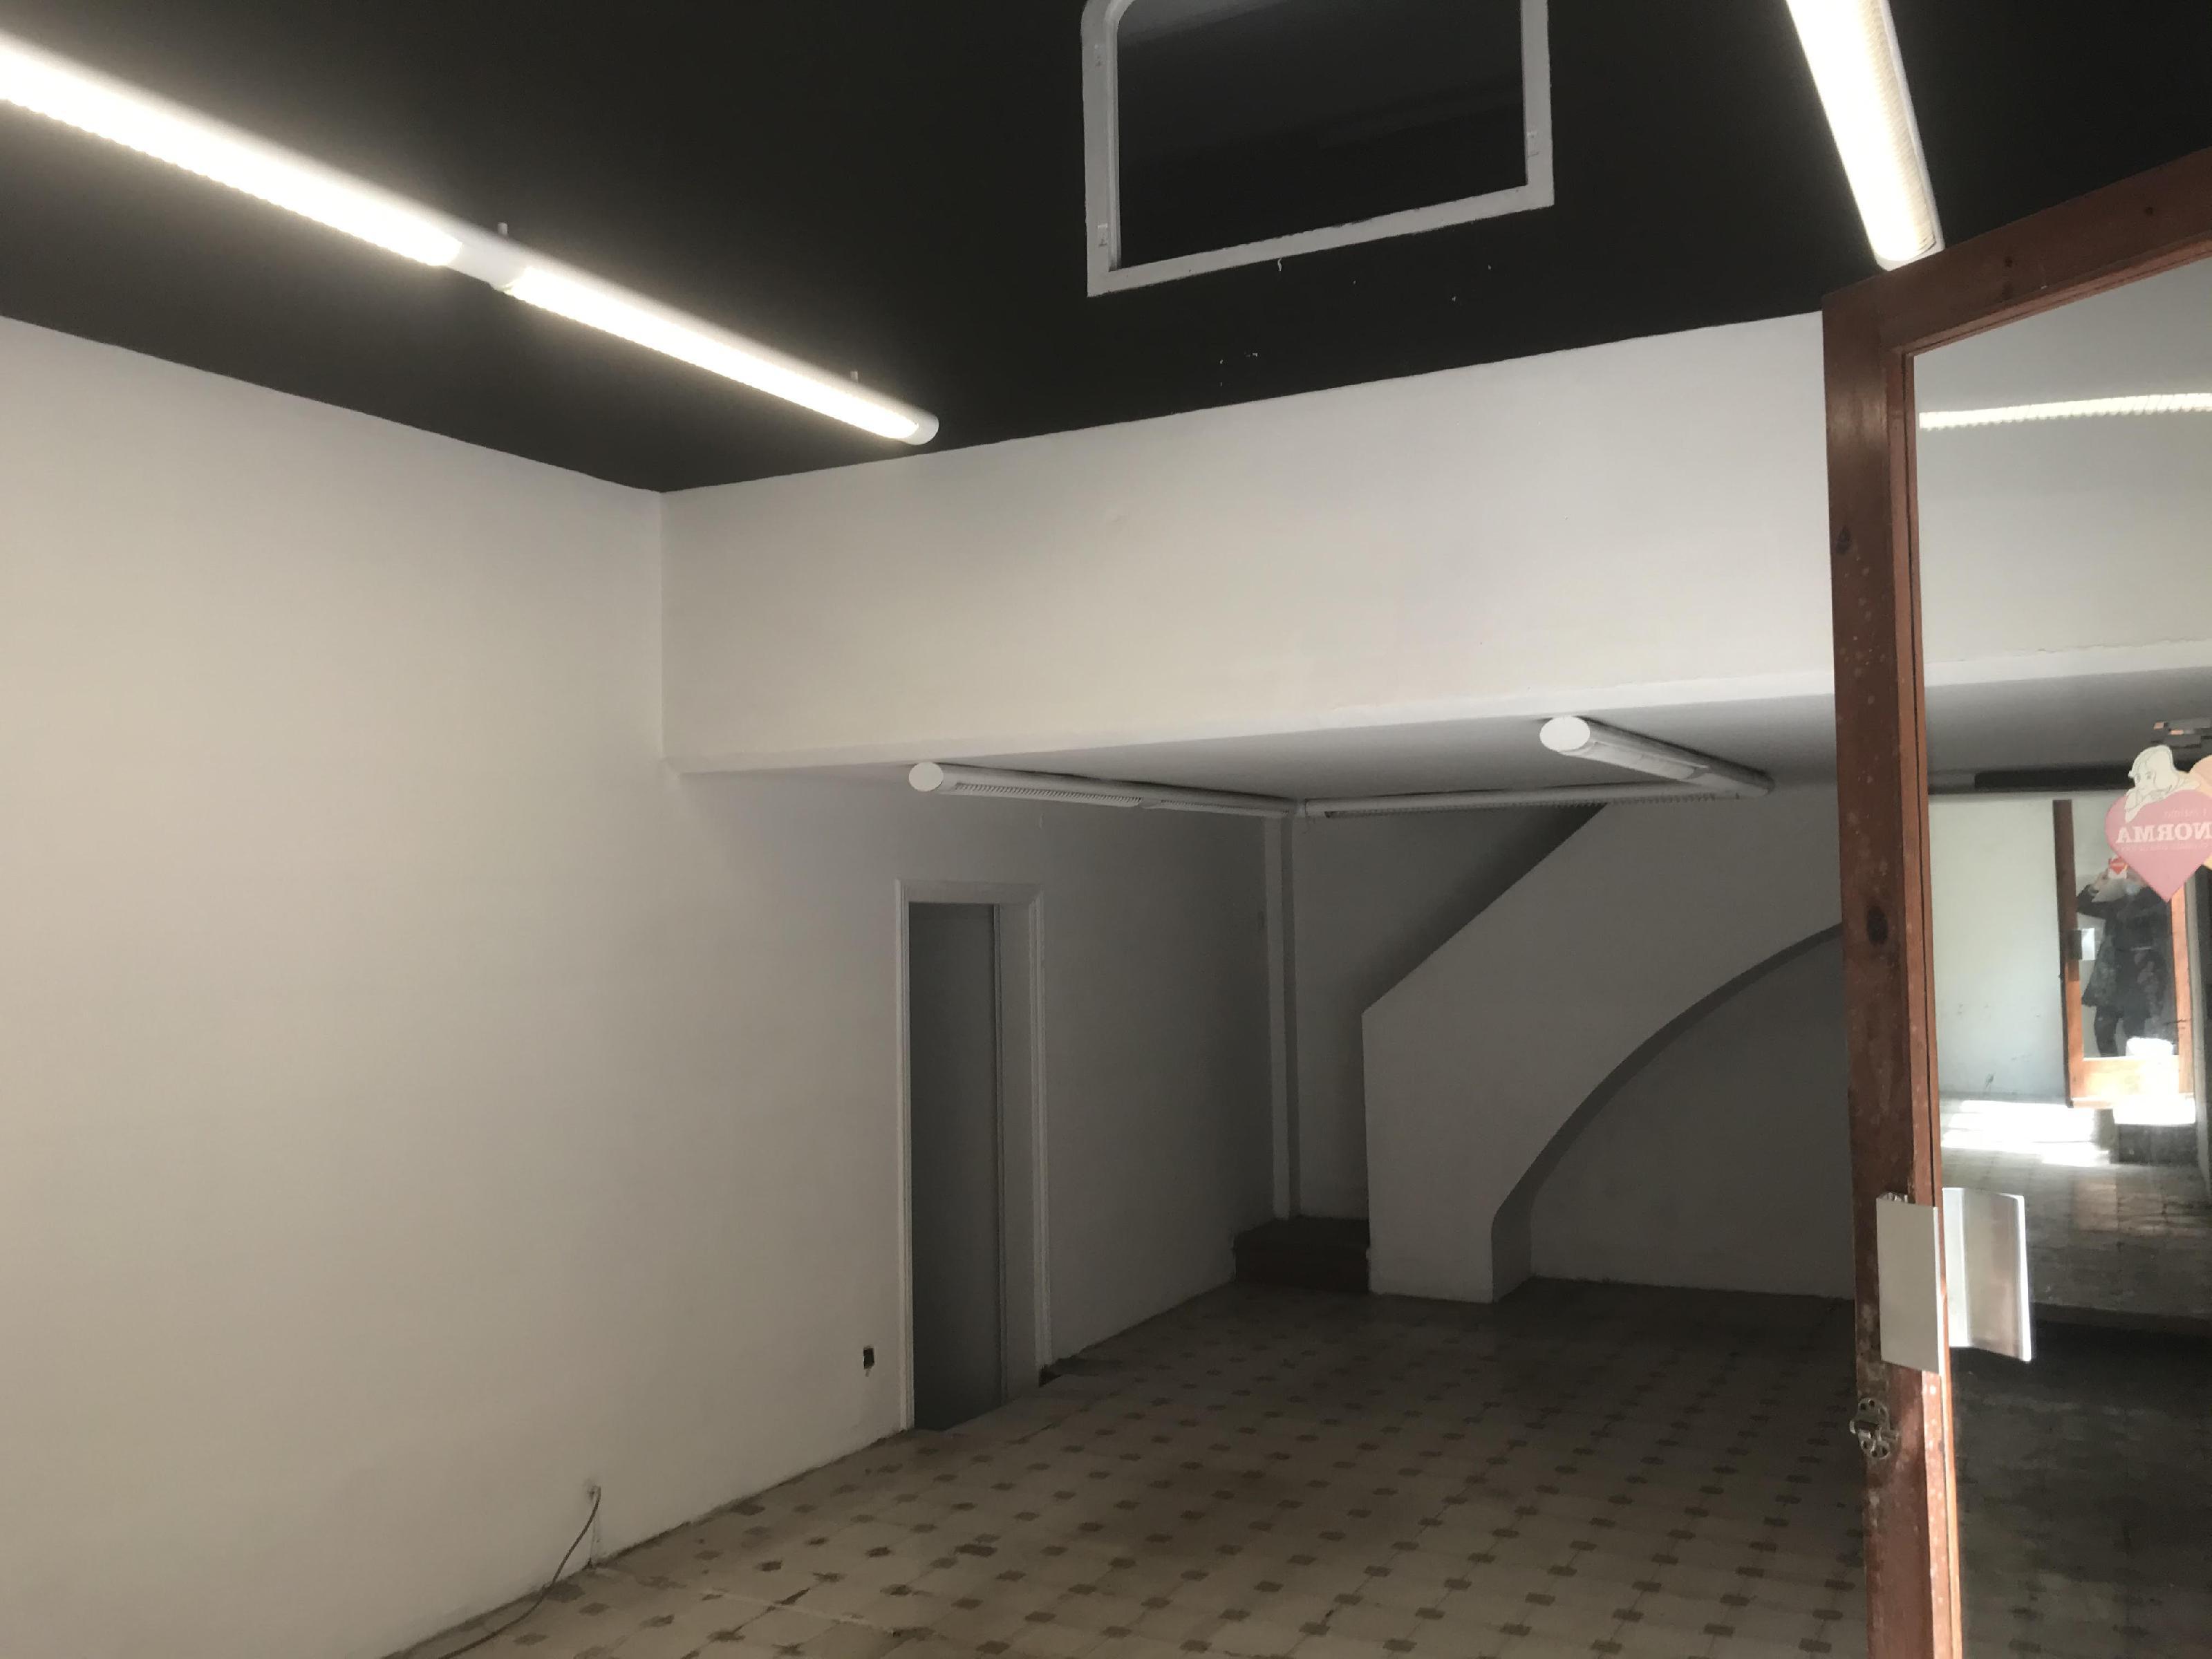 249614 Commercial premises for sale in Sarrià-Sant Gervasi, Sant Gervasi-Galvany 2